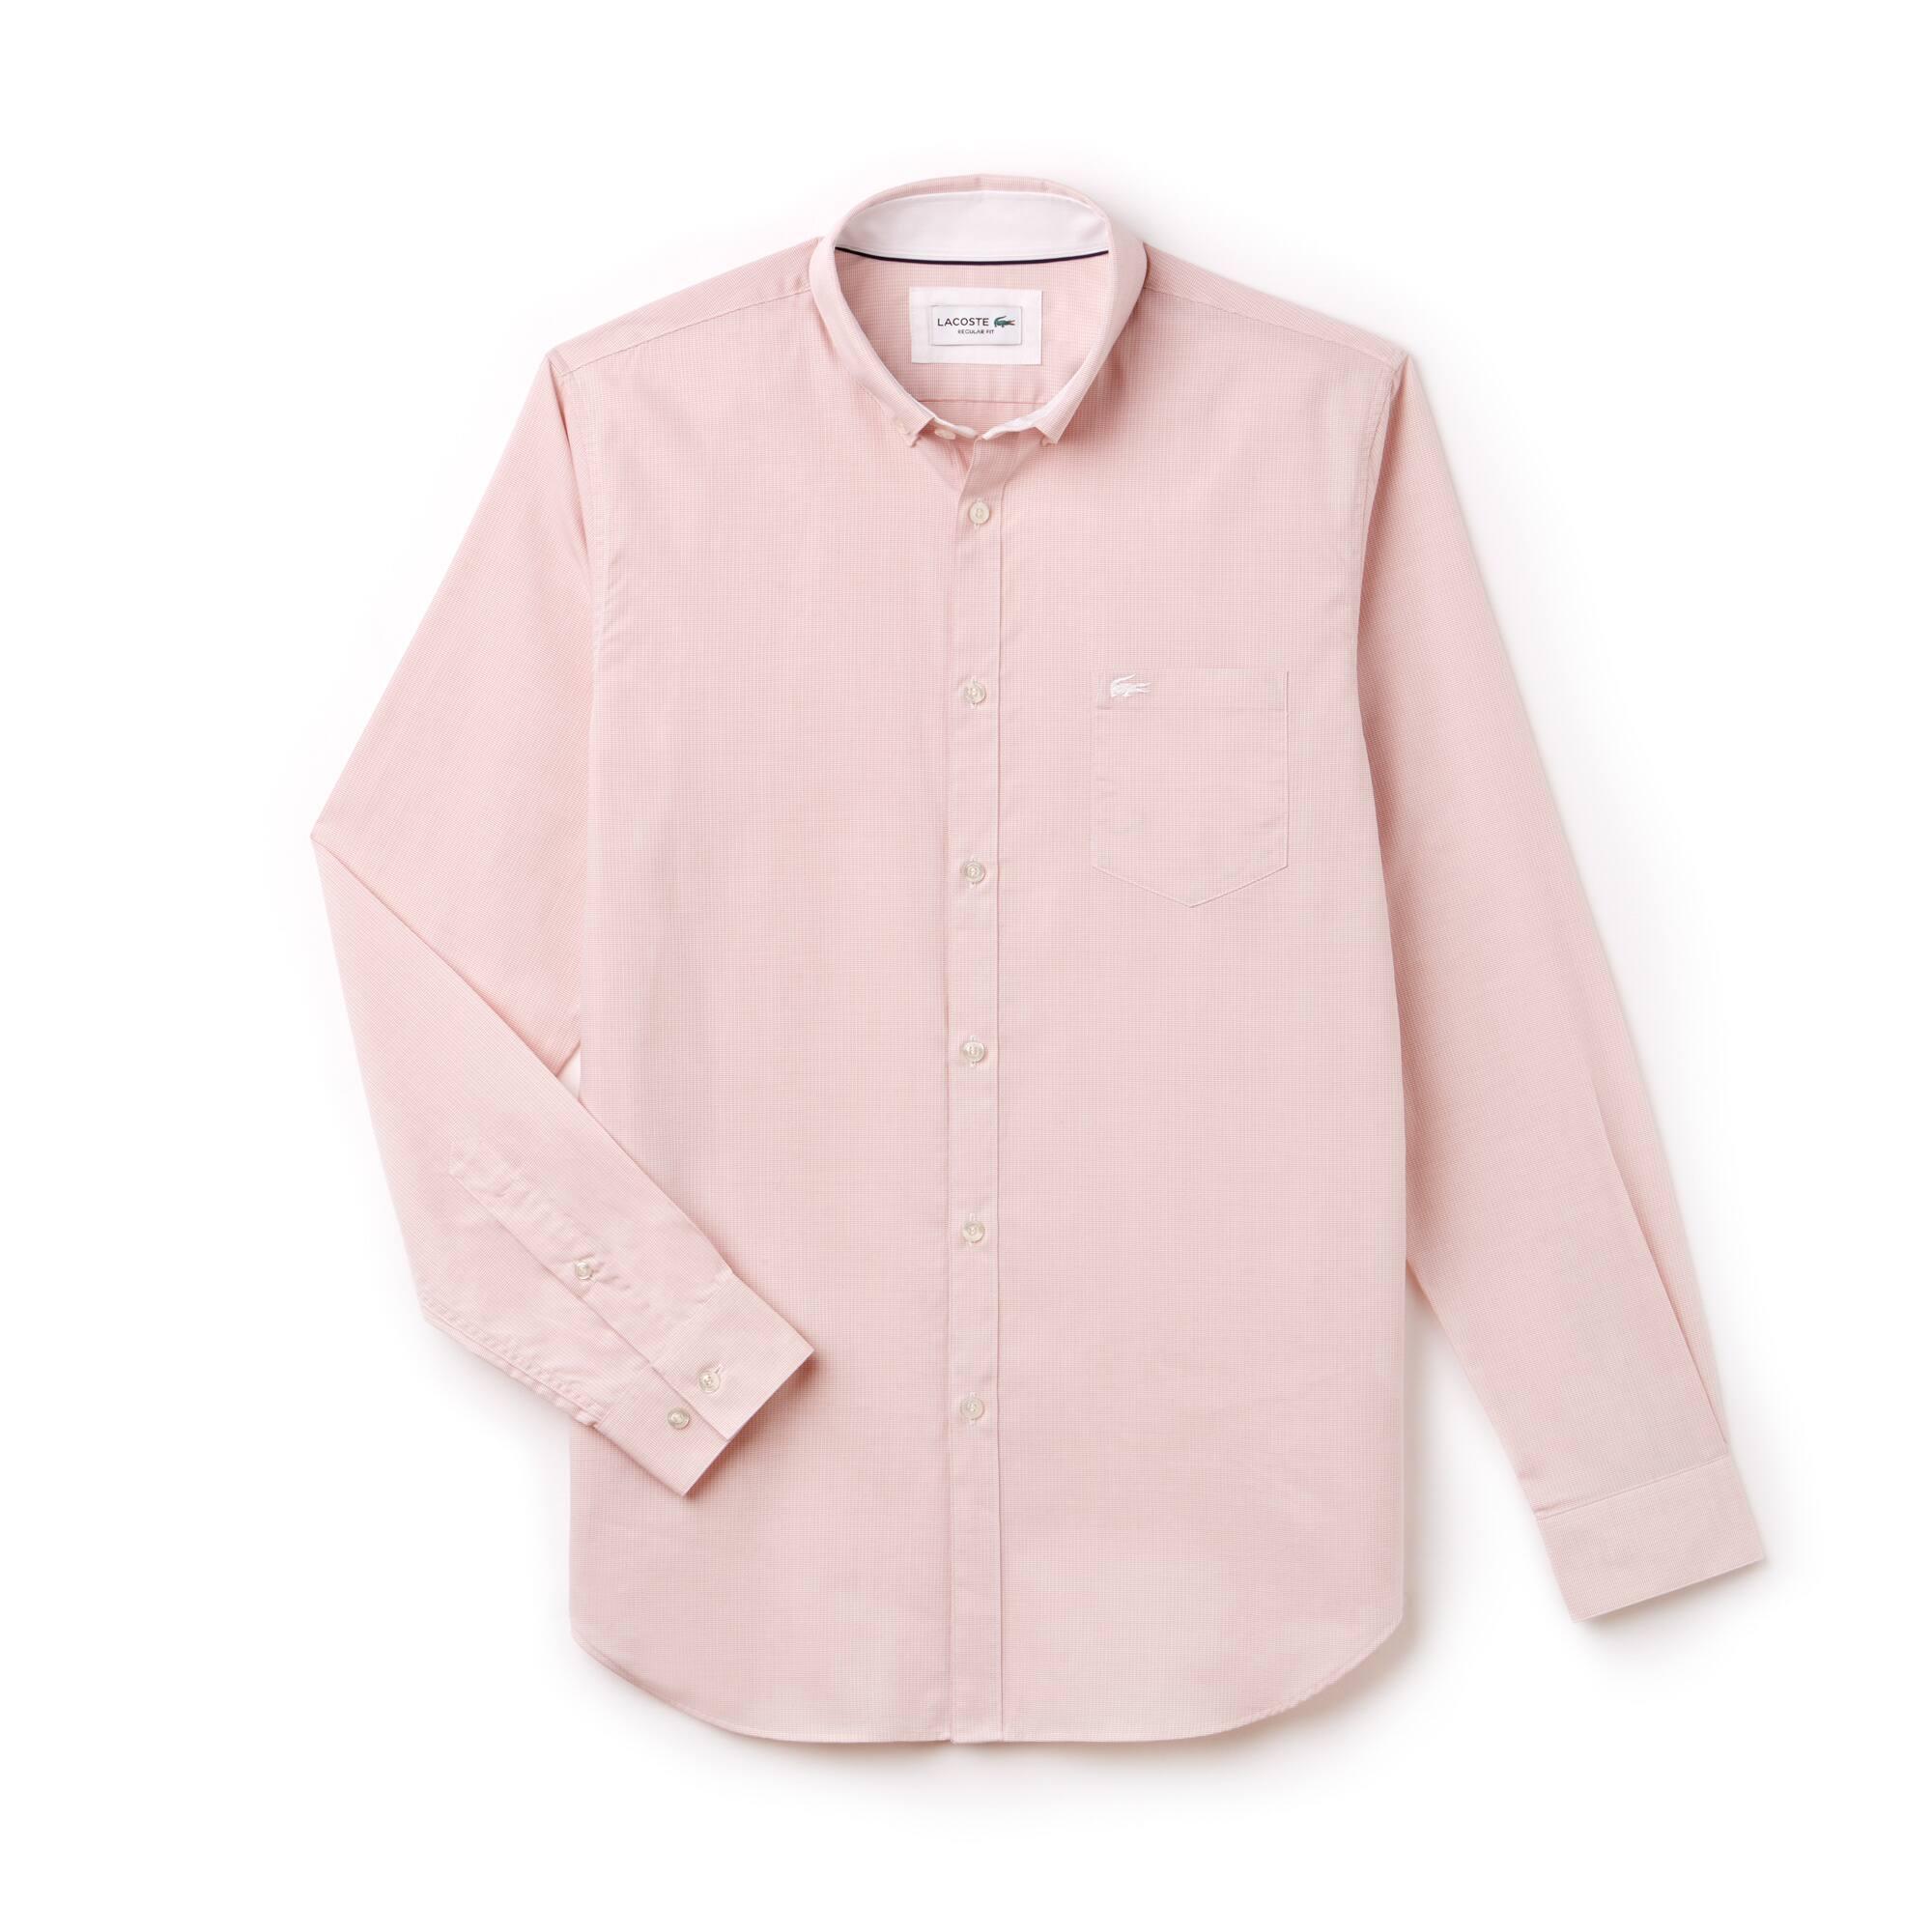 Camisa Regular Fit Masculina em Popeline Texturizada